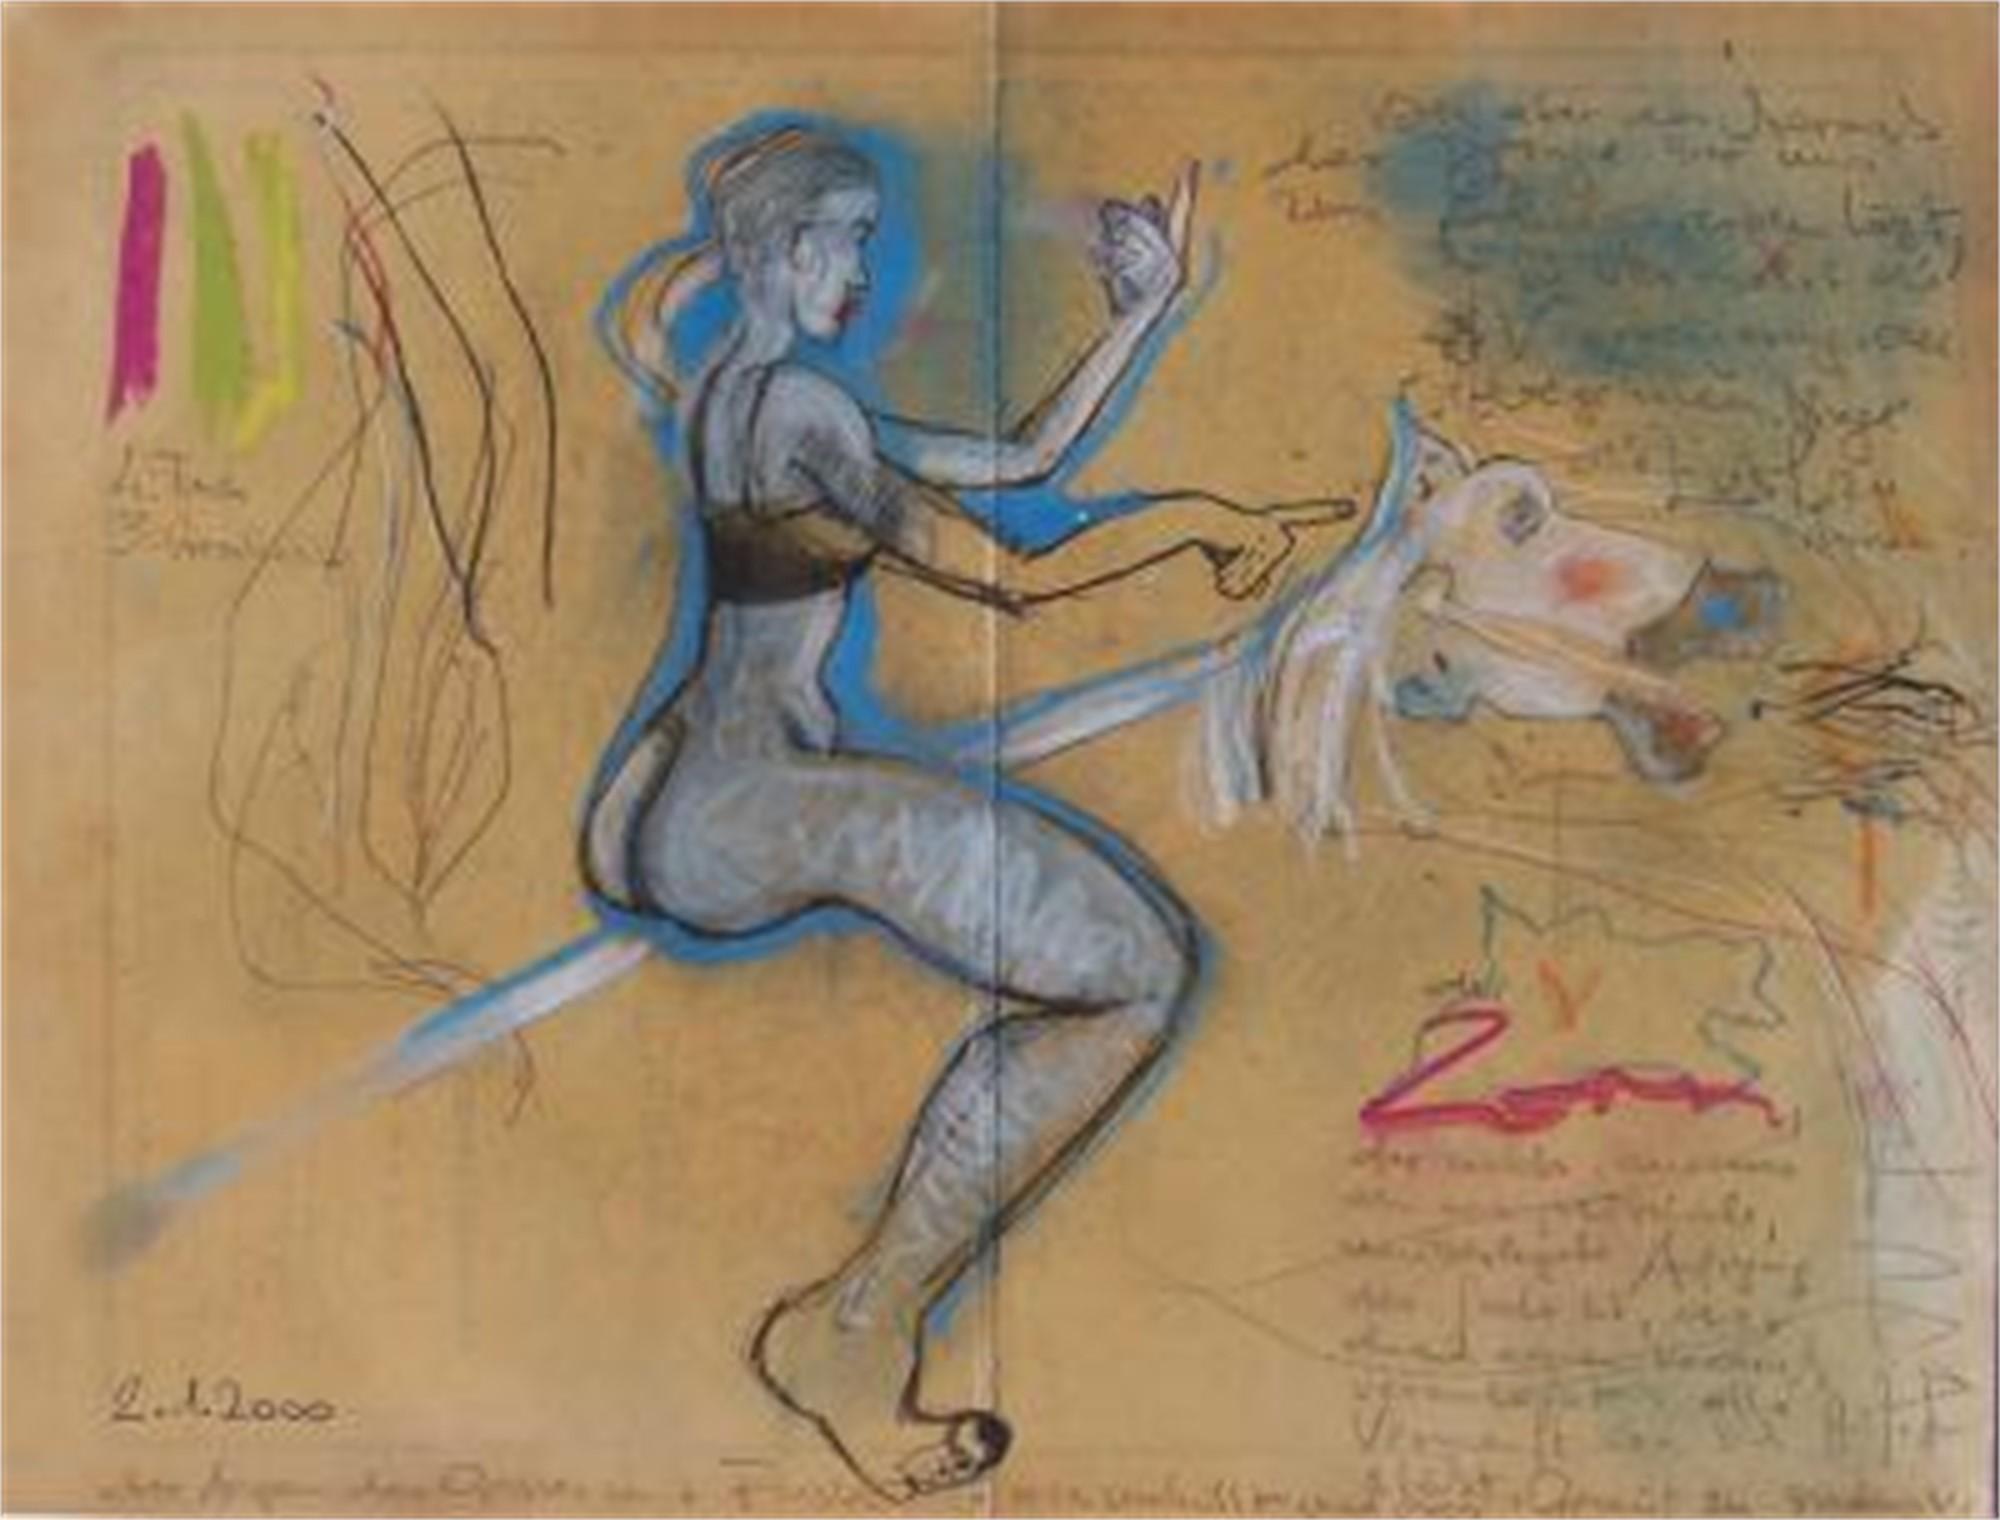 Am Pferd by Hans Joerg Fuerpass